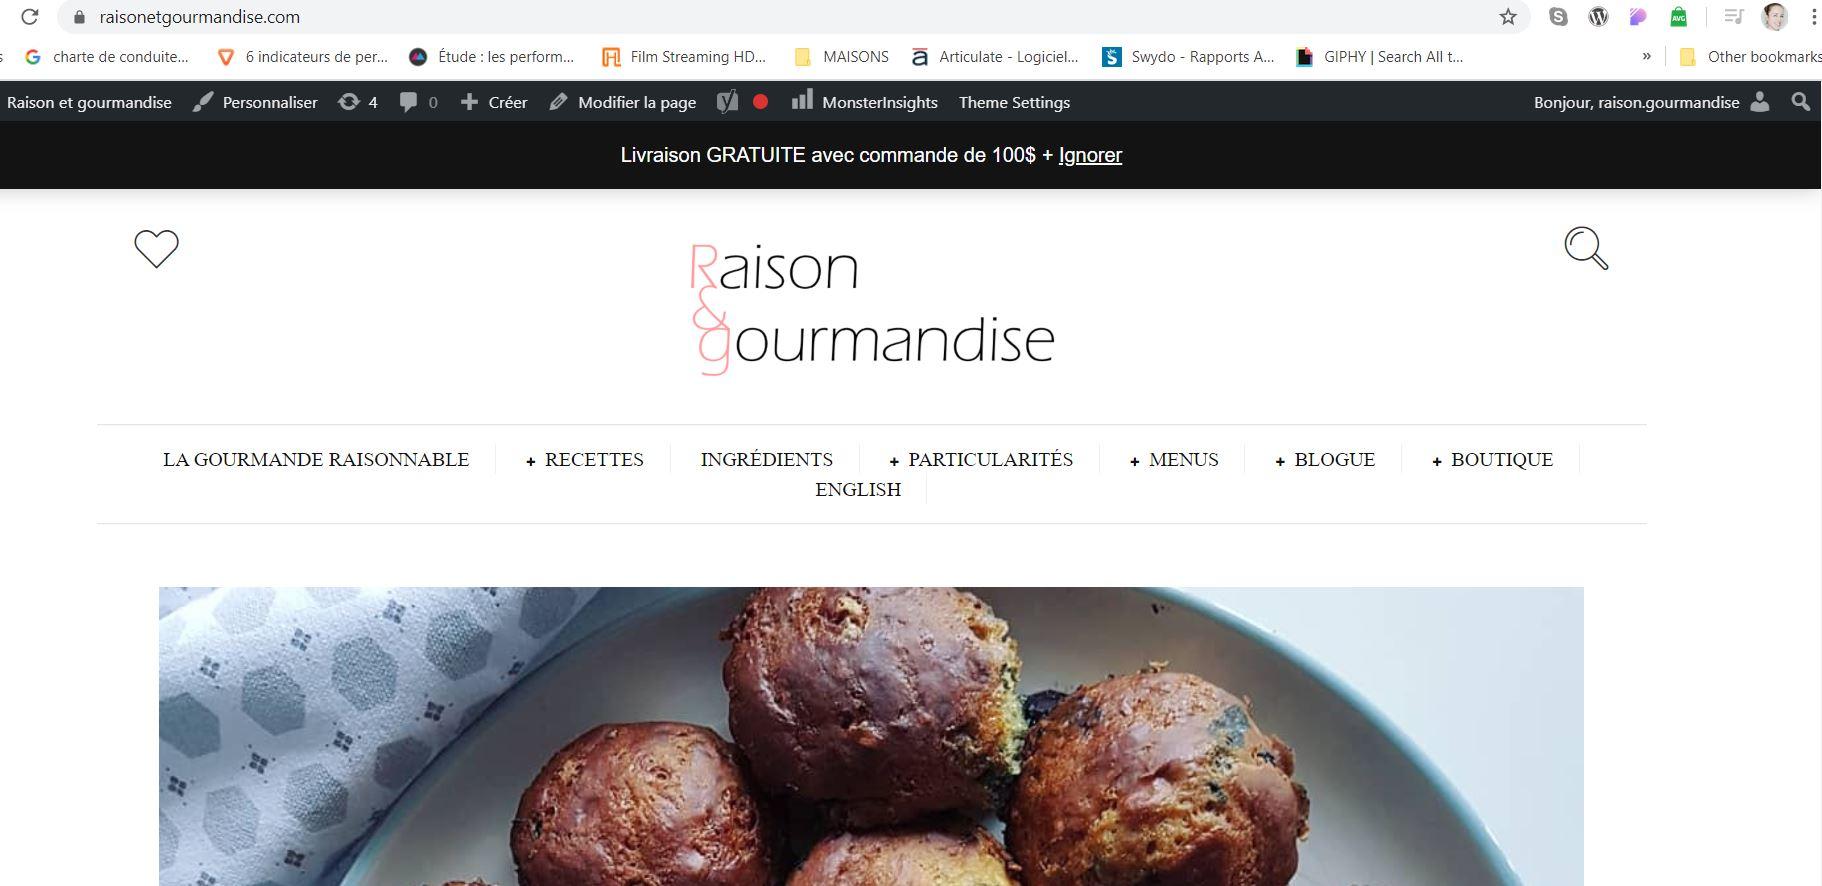 Homepage_FRENCH_08042020.JPG